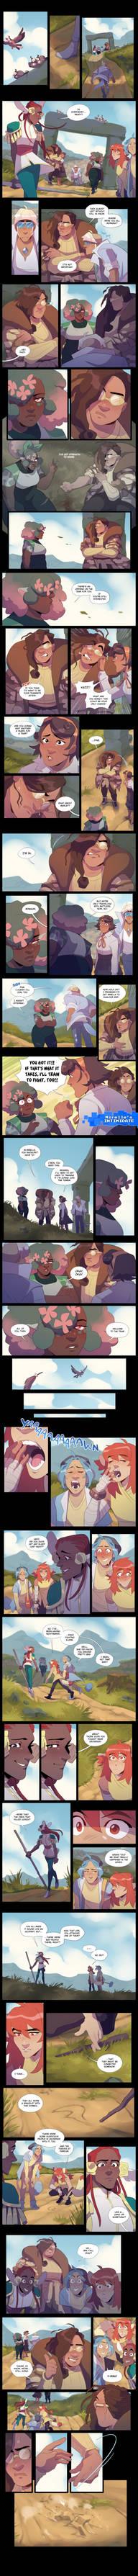 Burn Away - Page 47